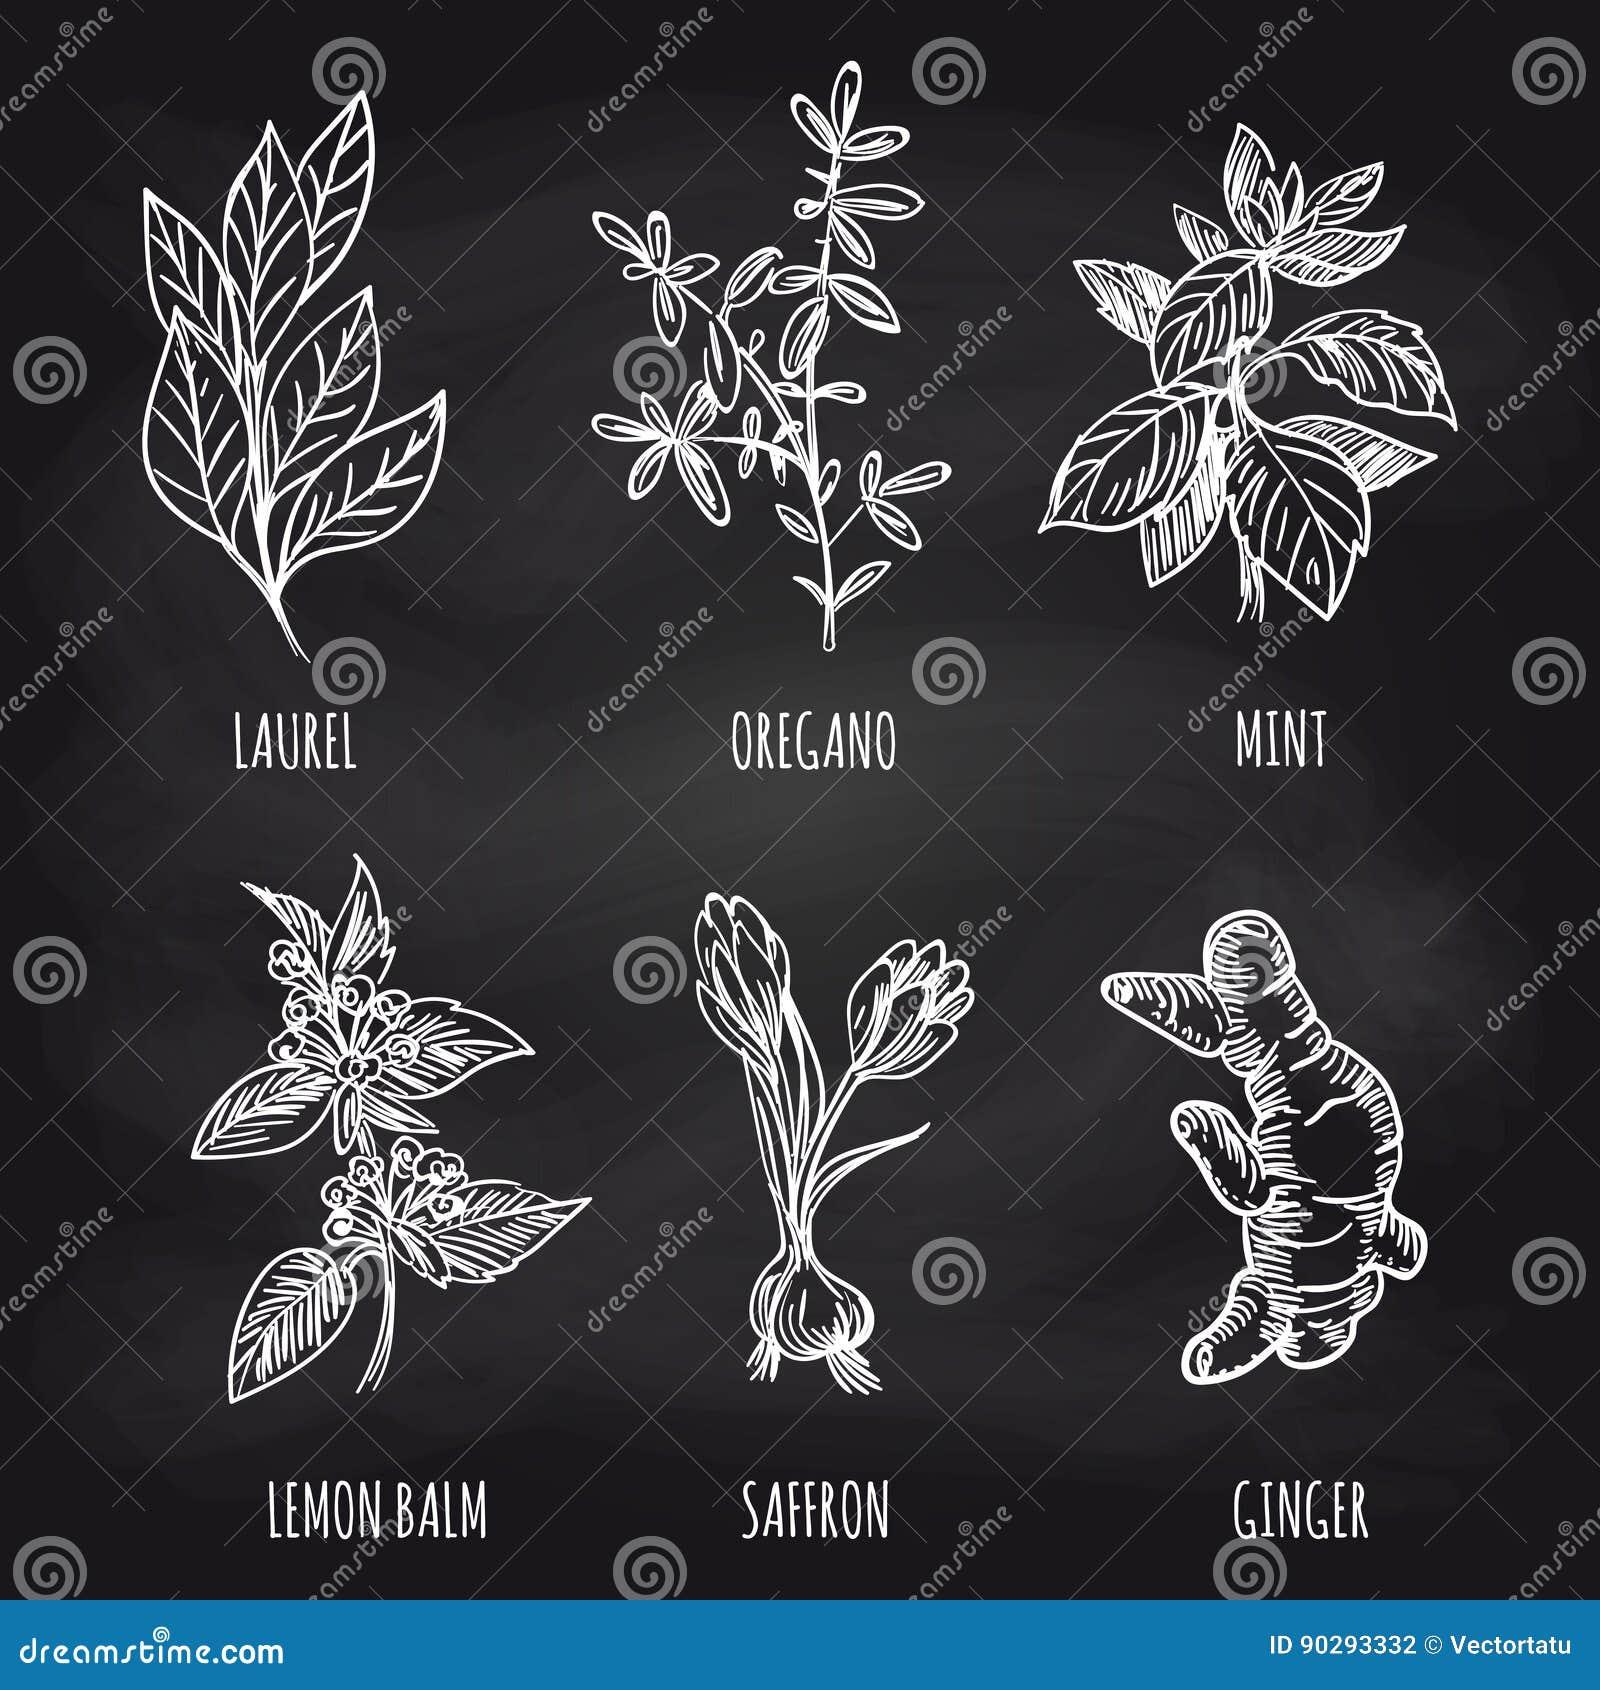 Herbs and spice on blackboard